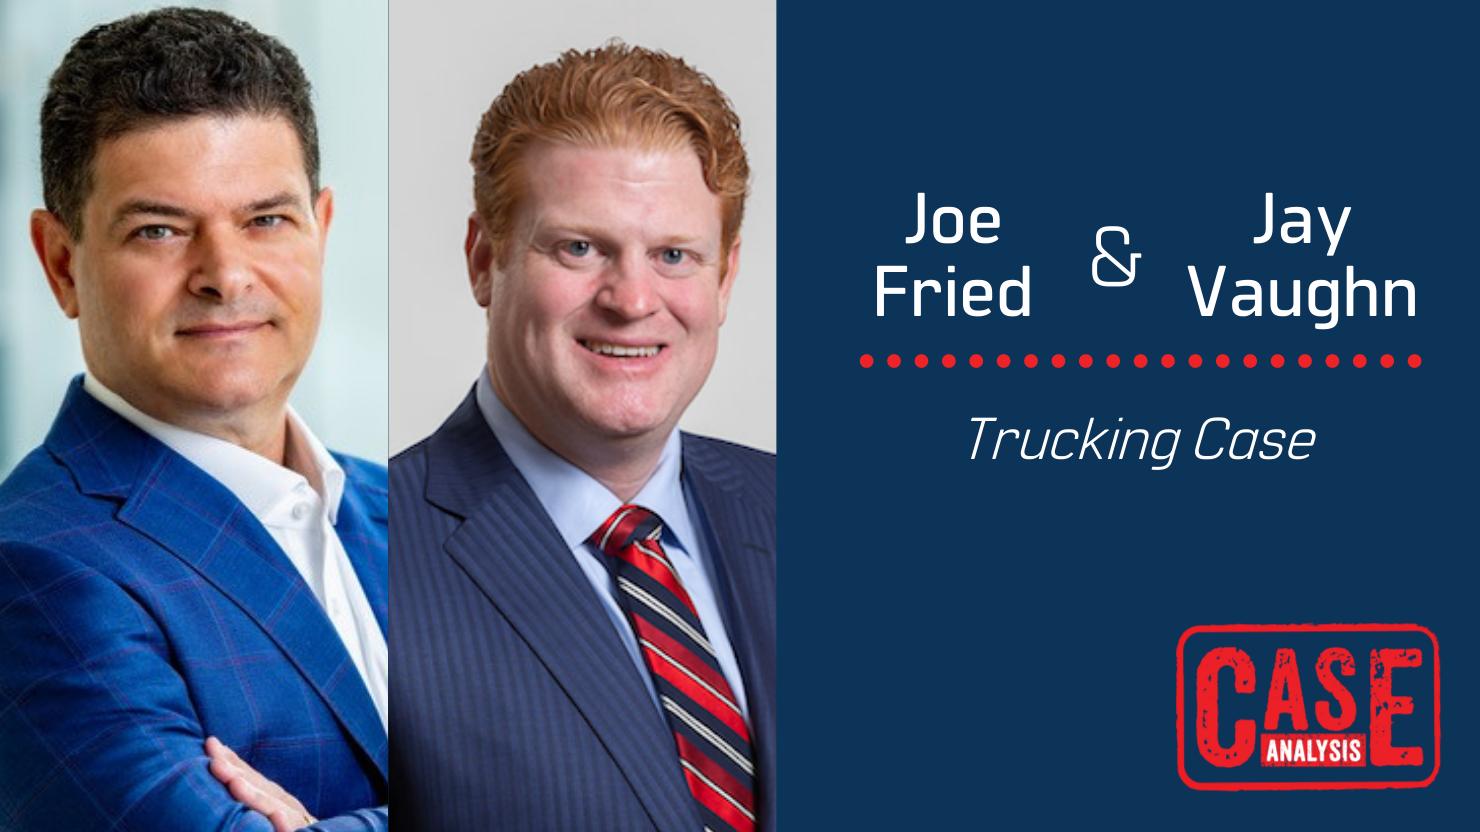 Joe Fried & Jay Vaughn - Trucking Case